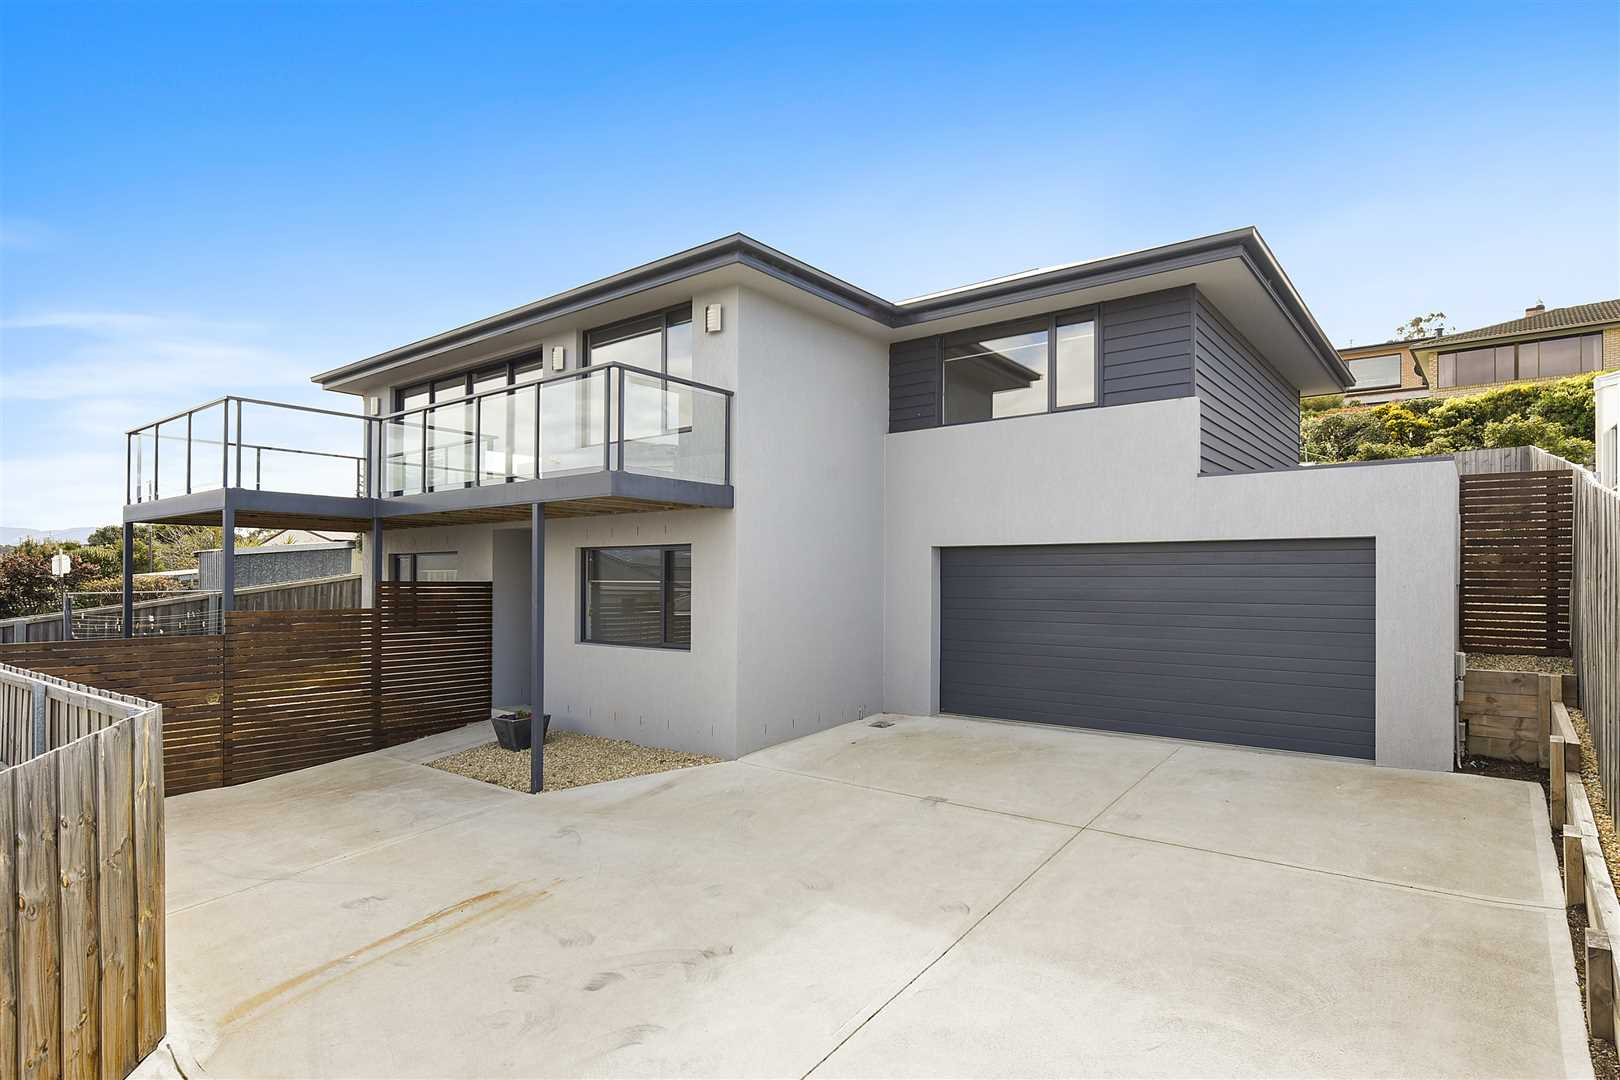 Stylish Home - Impressive Views